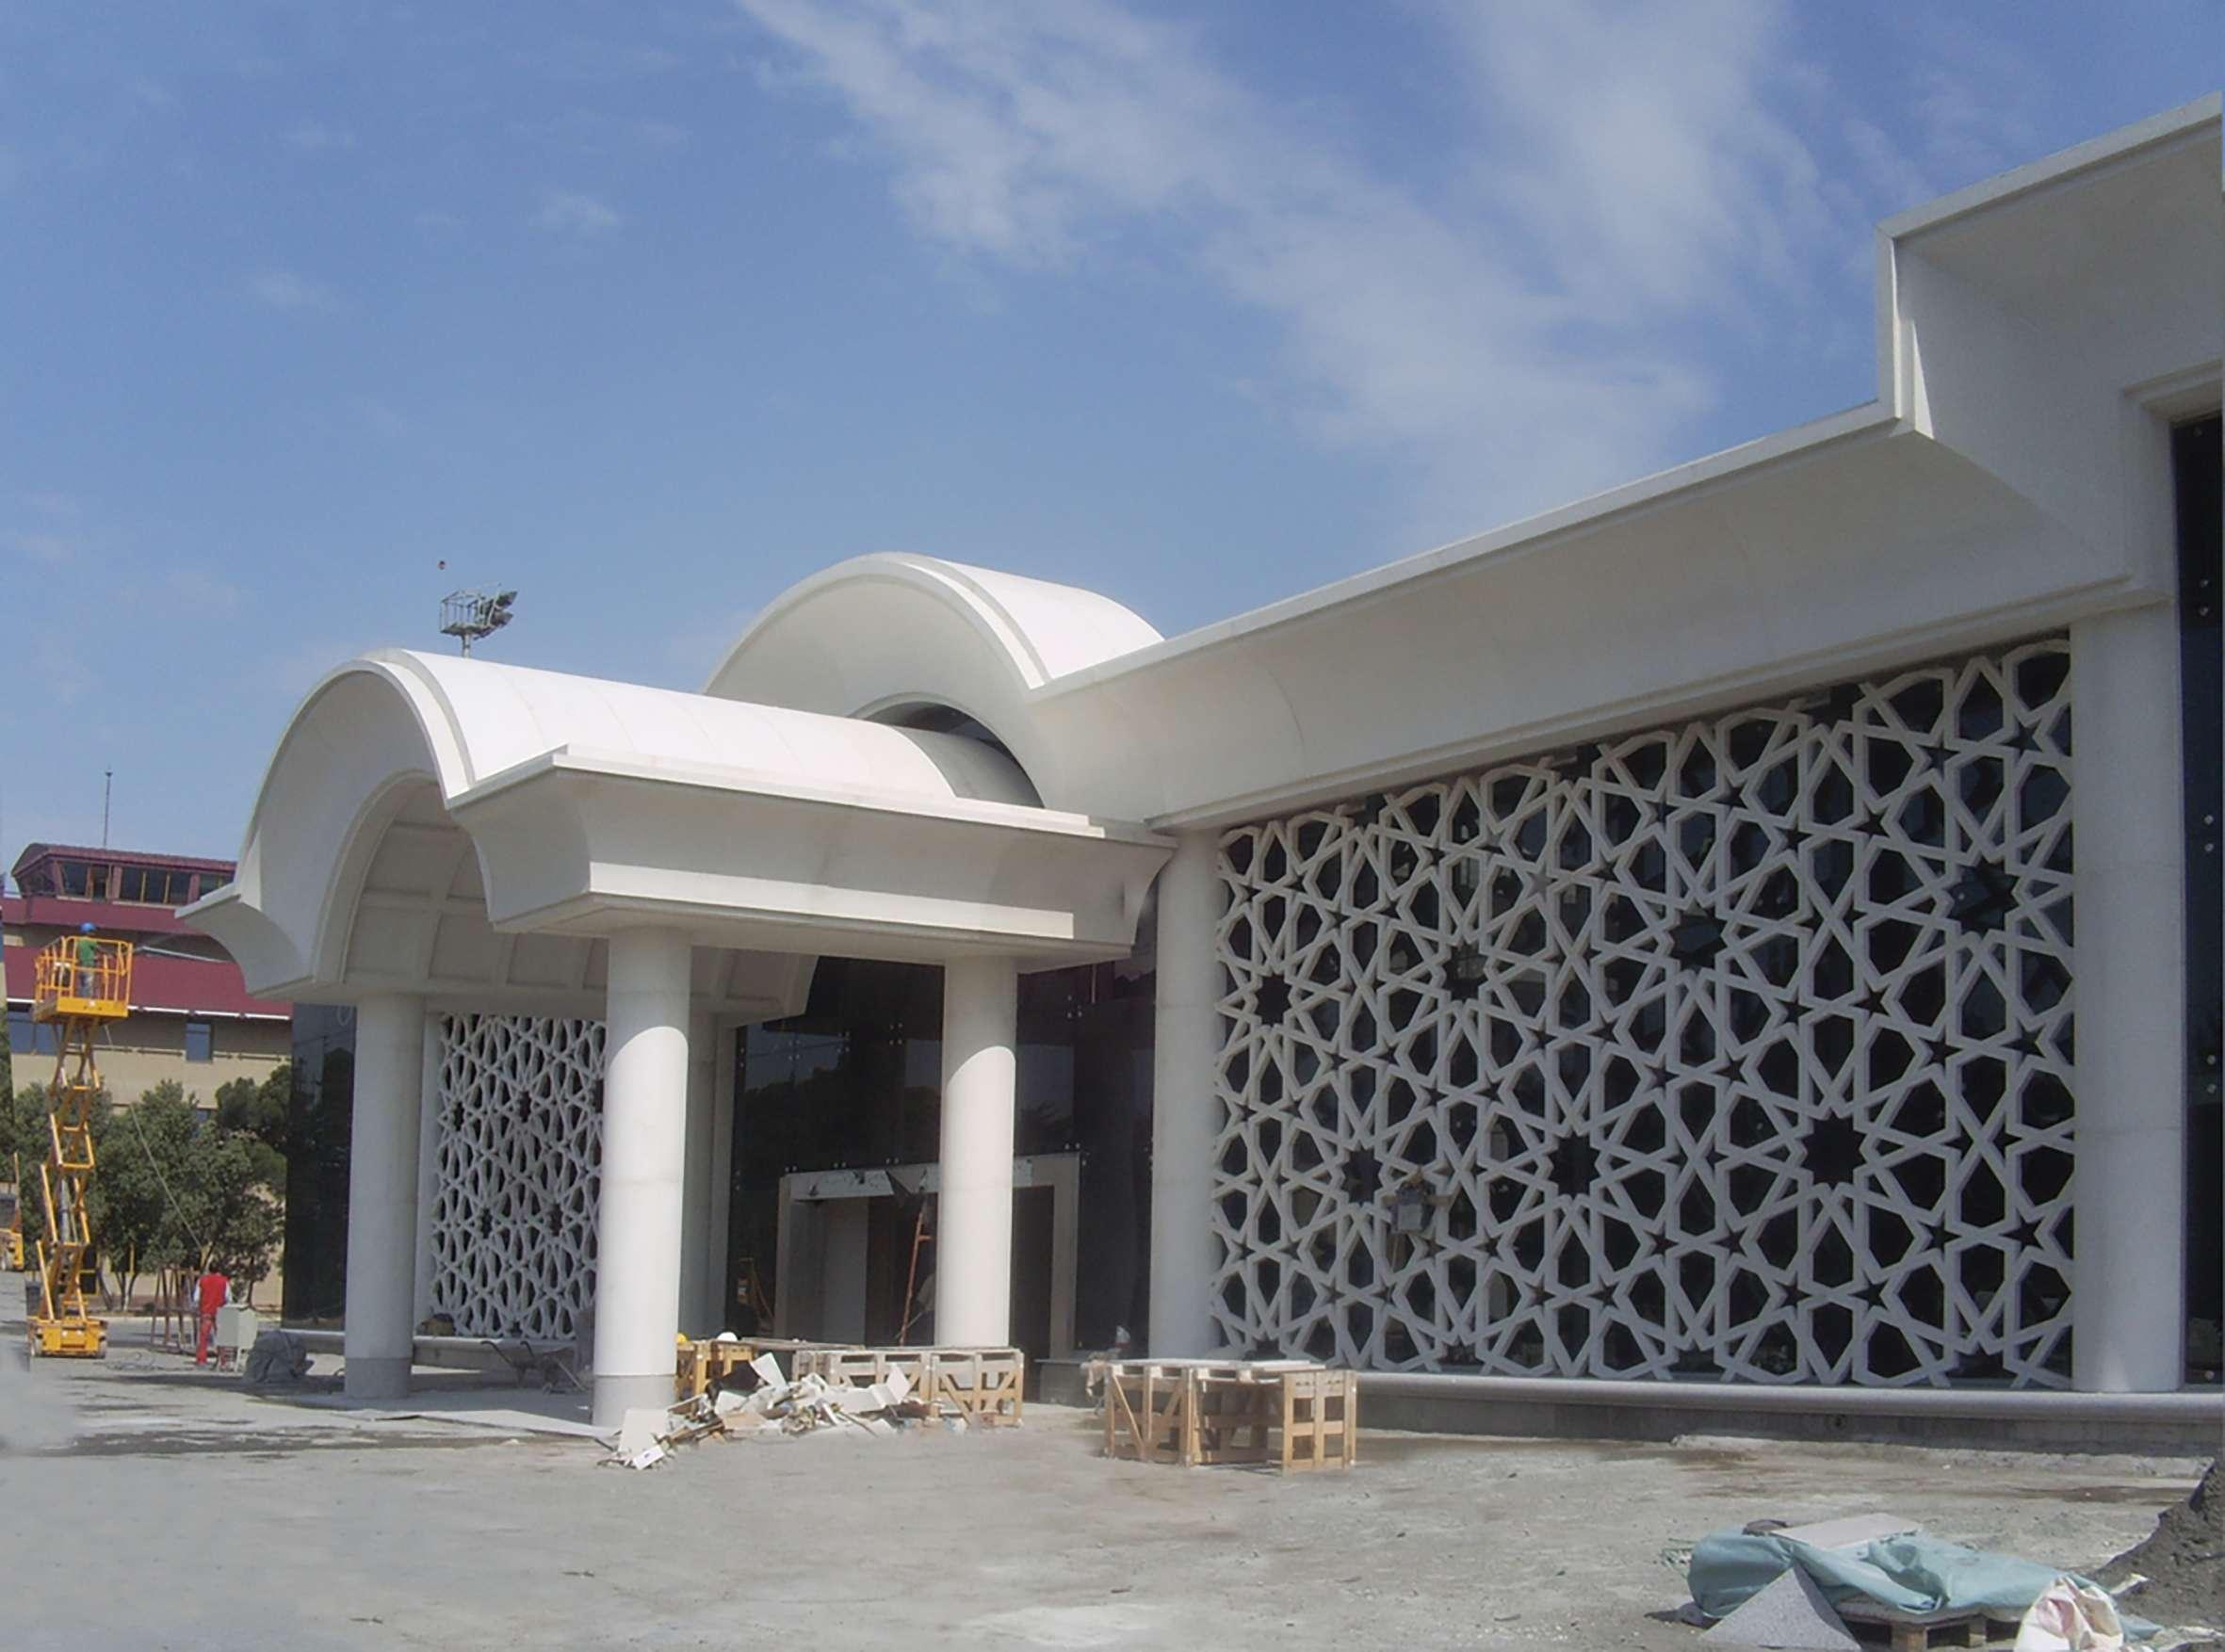 Fibrobeton Haydar Aliyev Airport Vip Lounge